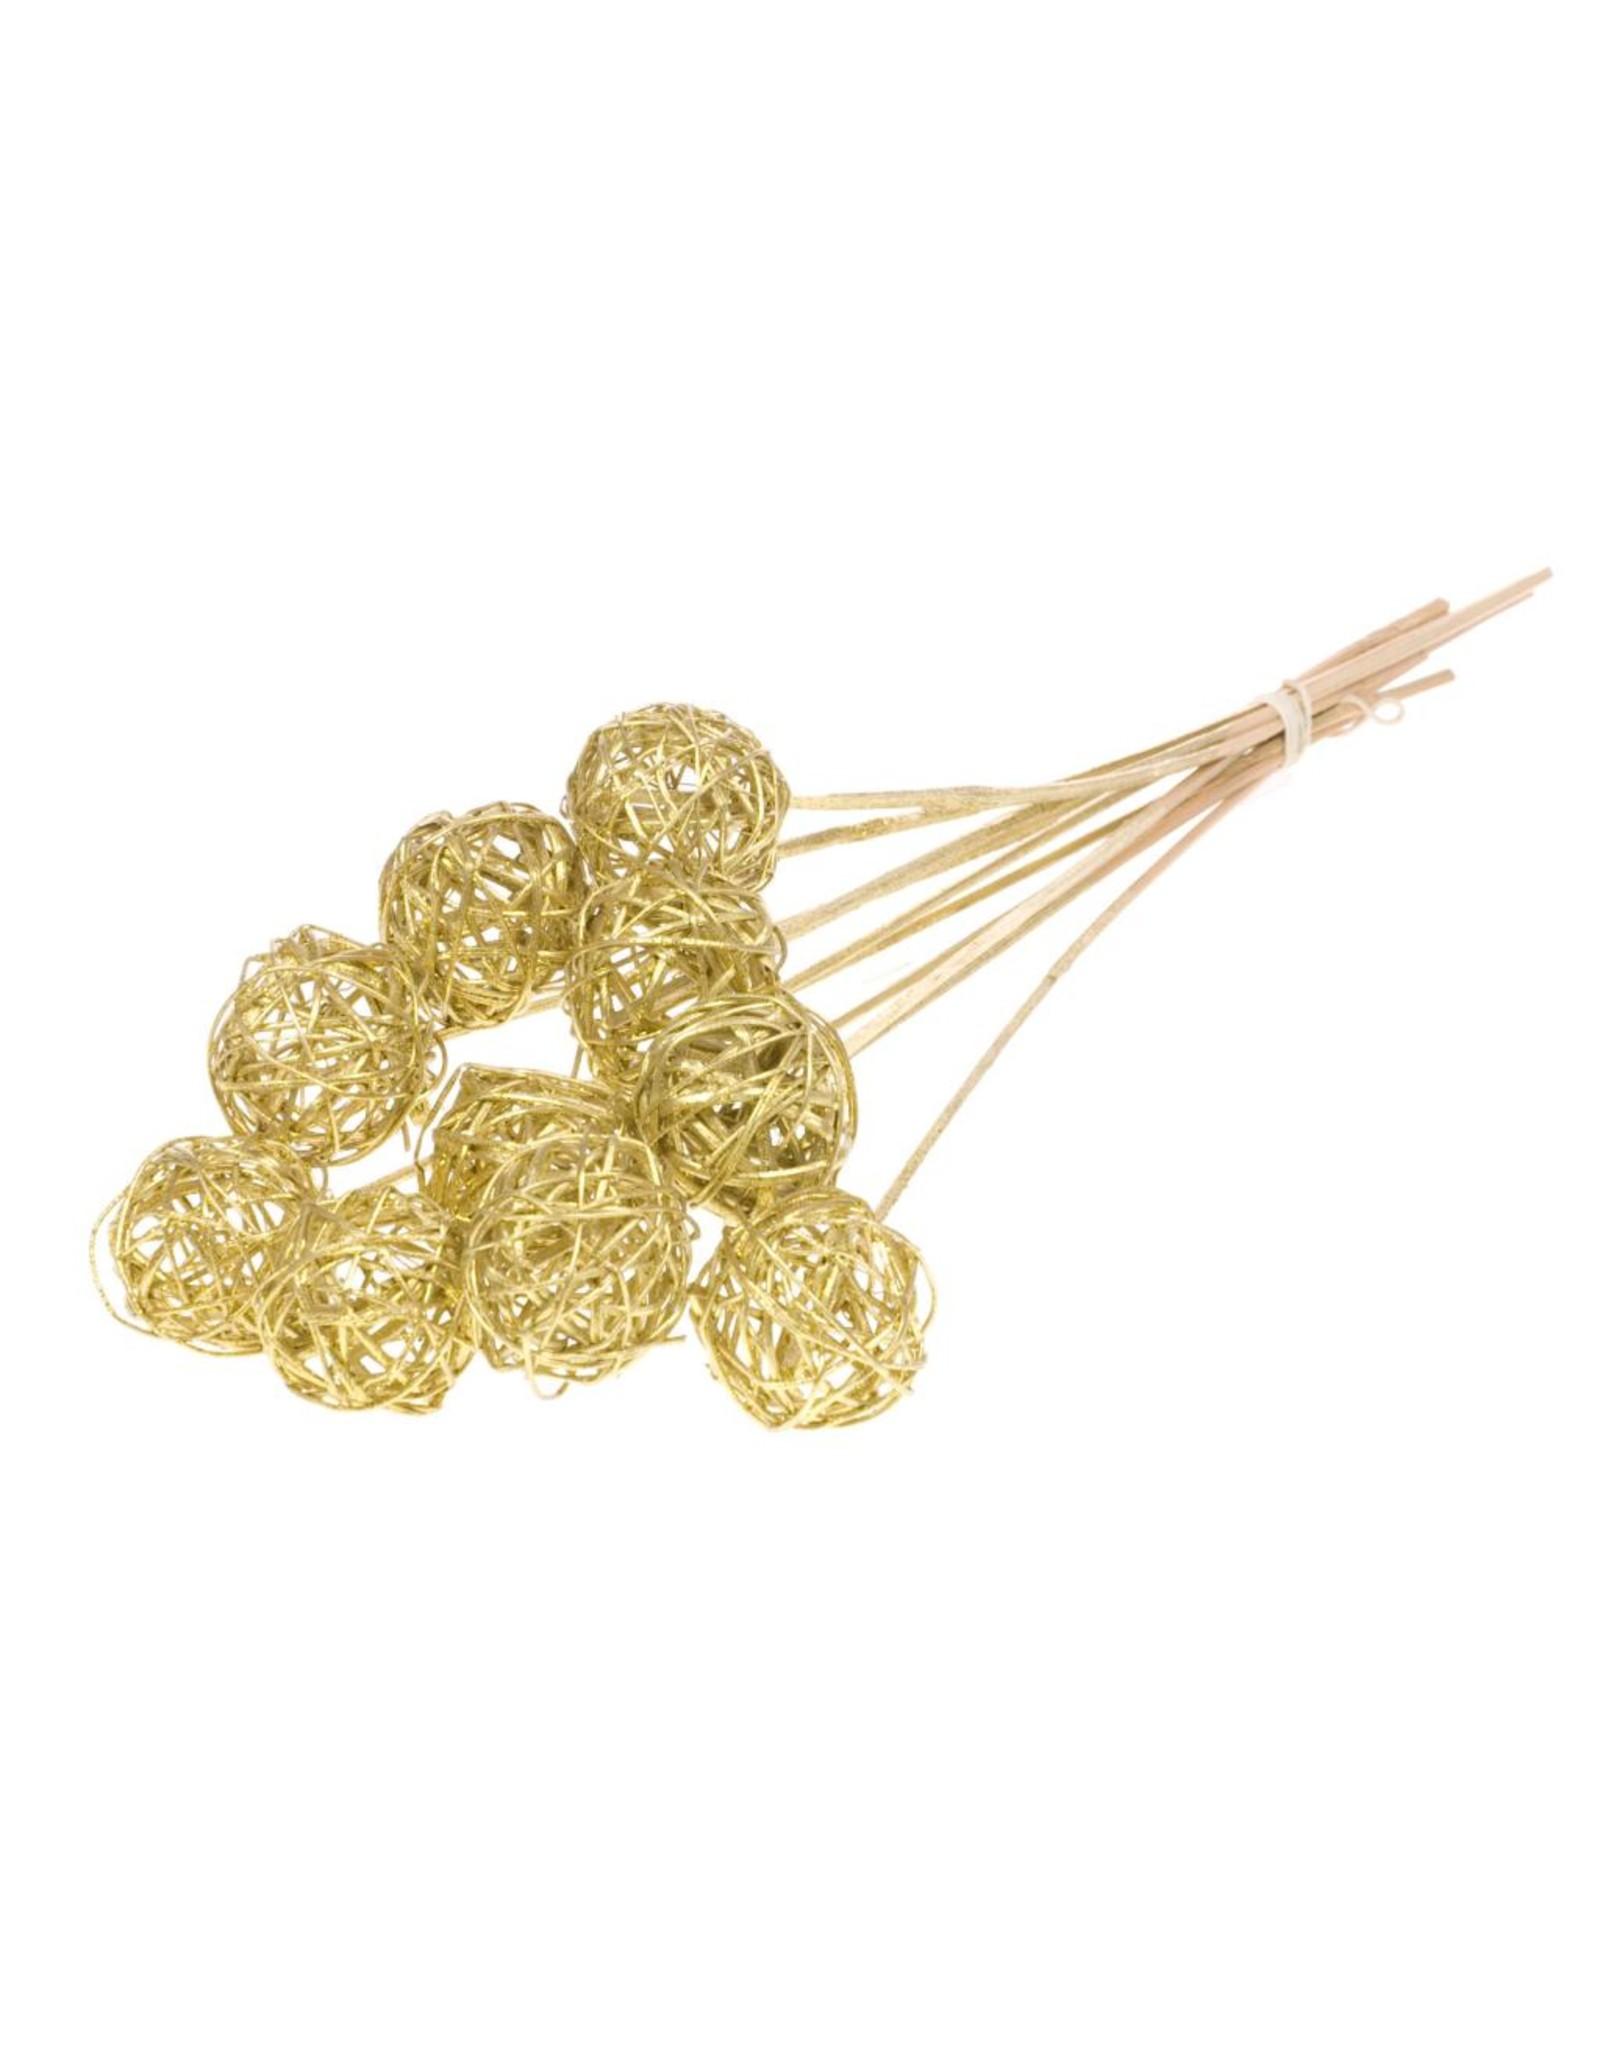 Brunch ball 5cm o/s 10pc SB gold gold glitter x 3